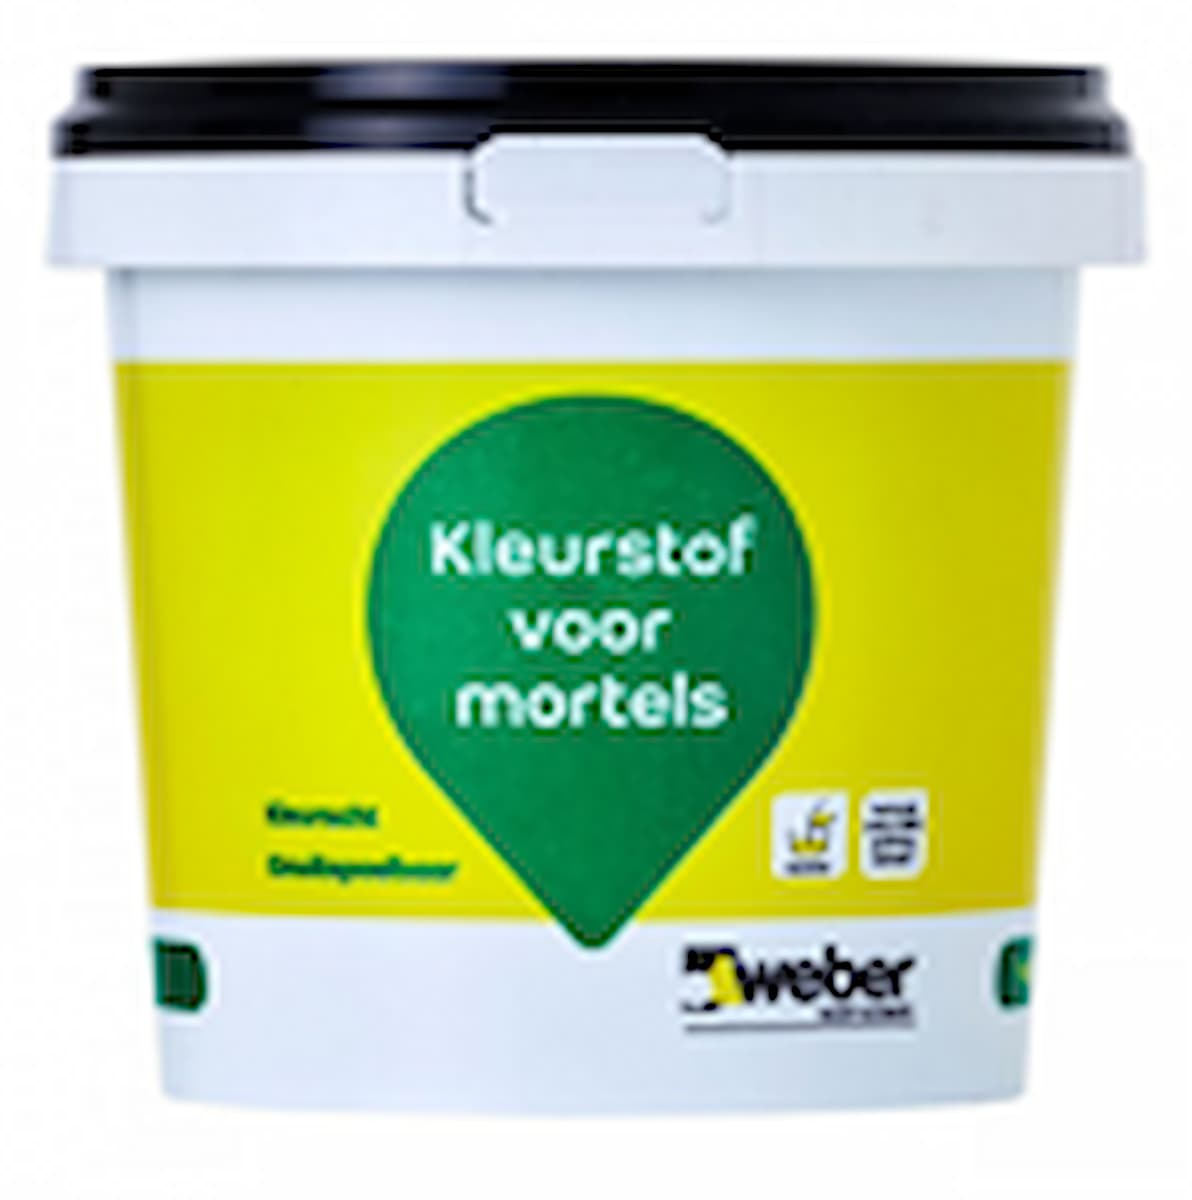 Kleurstof (2)